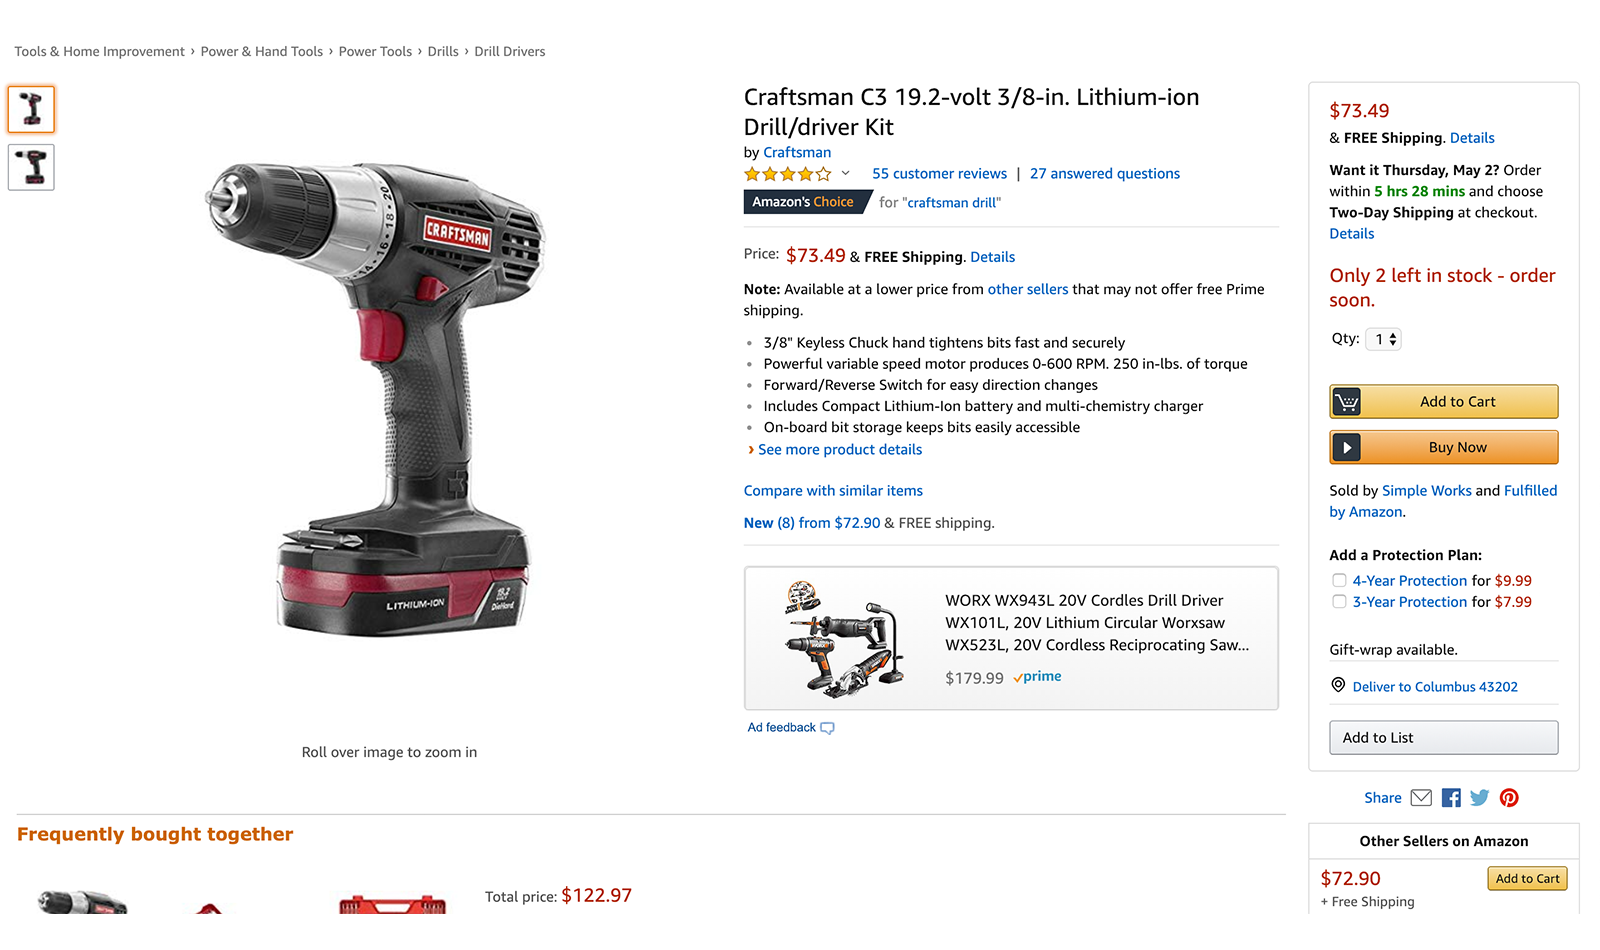 amazon-craftsman-c3-product-detail-page